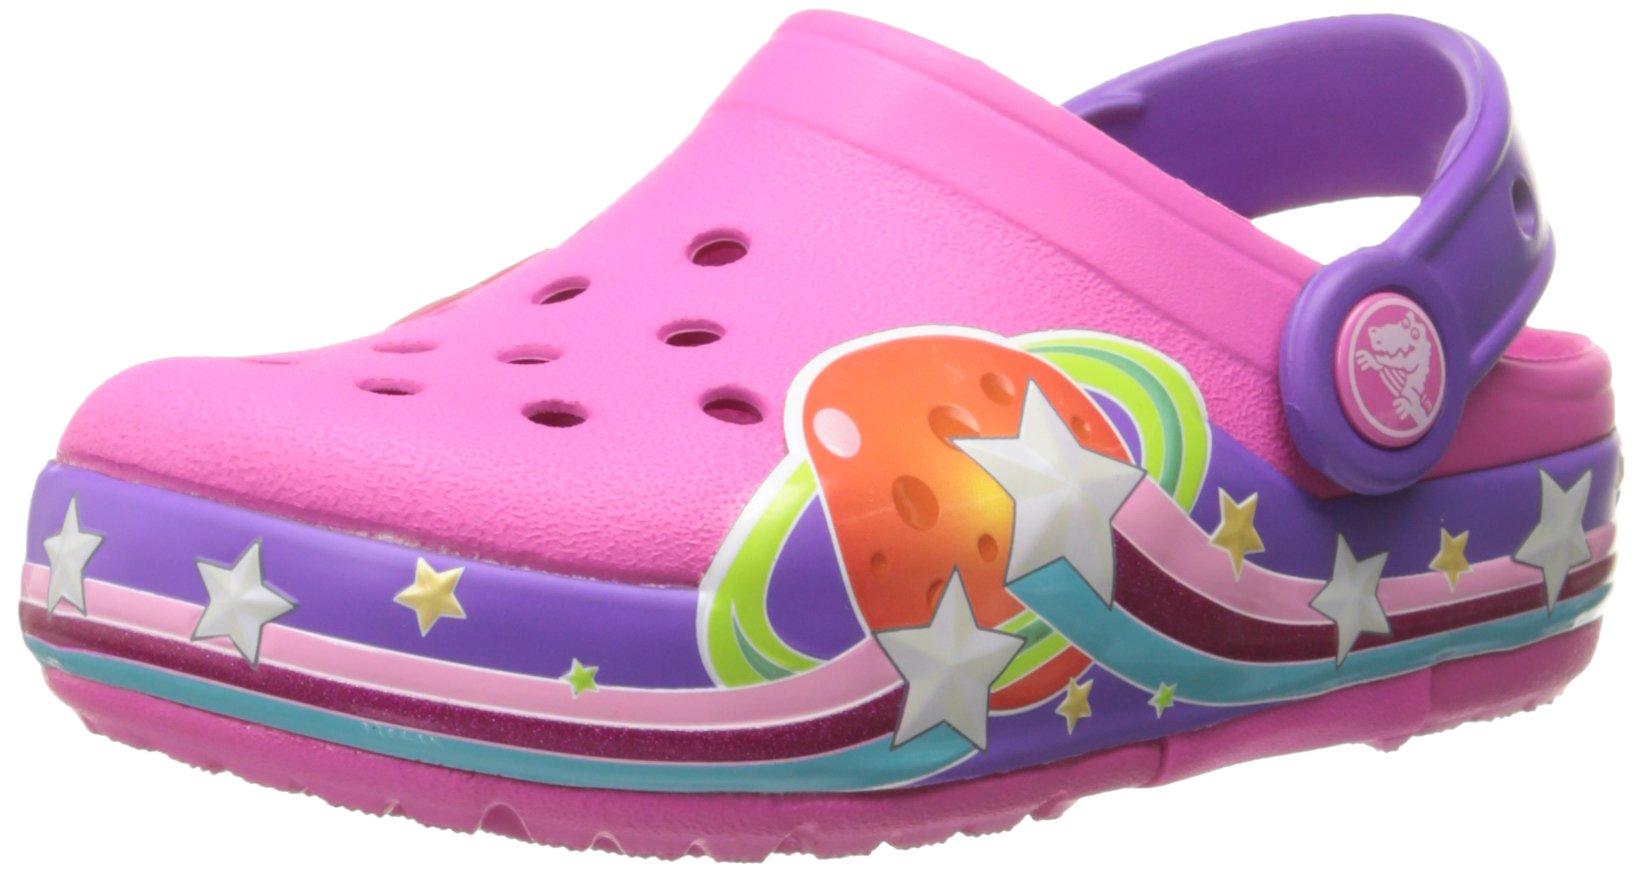 crocs Girls Galactic Light-Up Clog (Toddler/Little Kid), Neon Magenta, 12 M US Little Kid